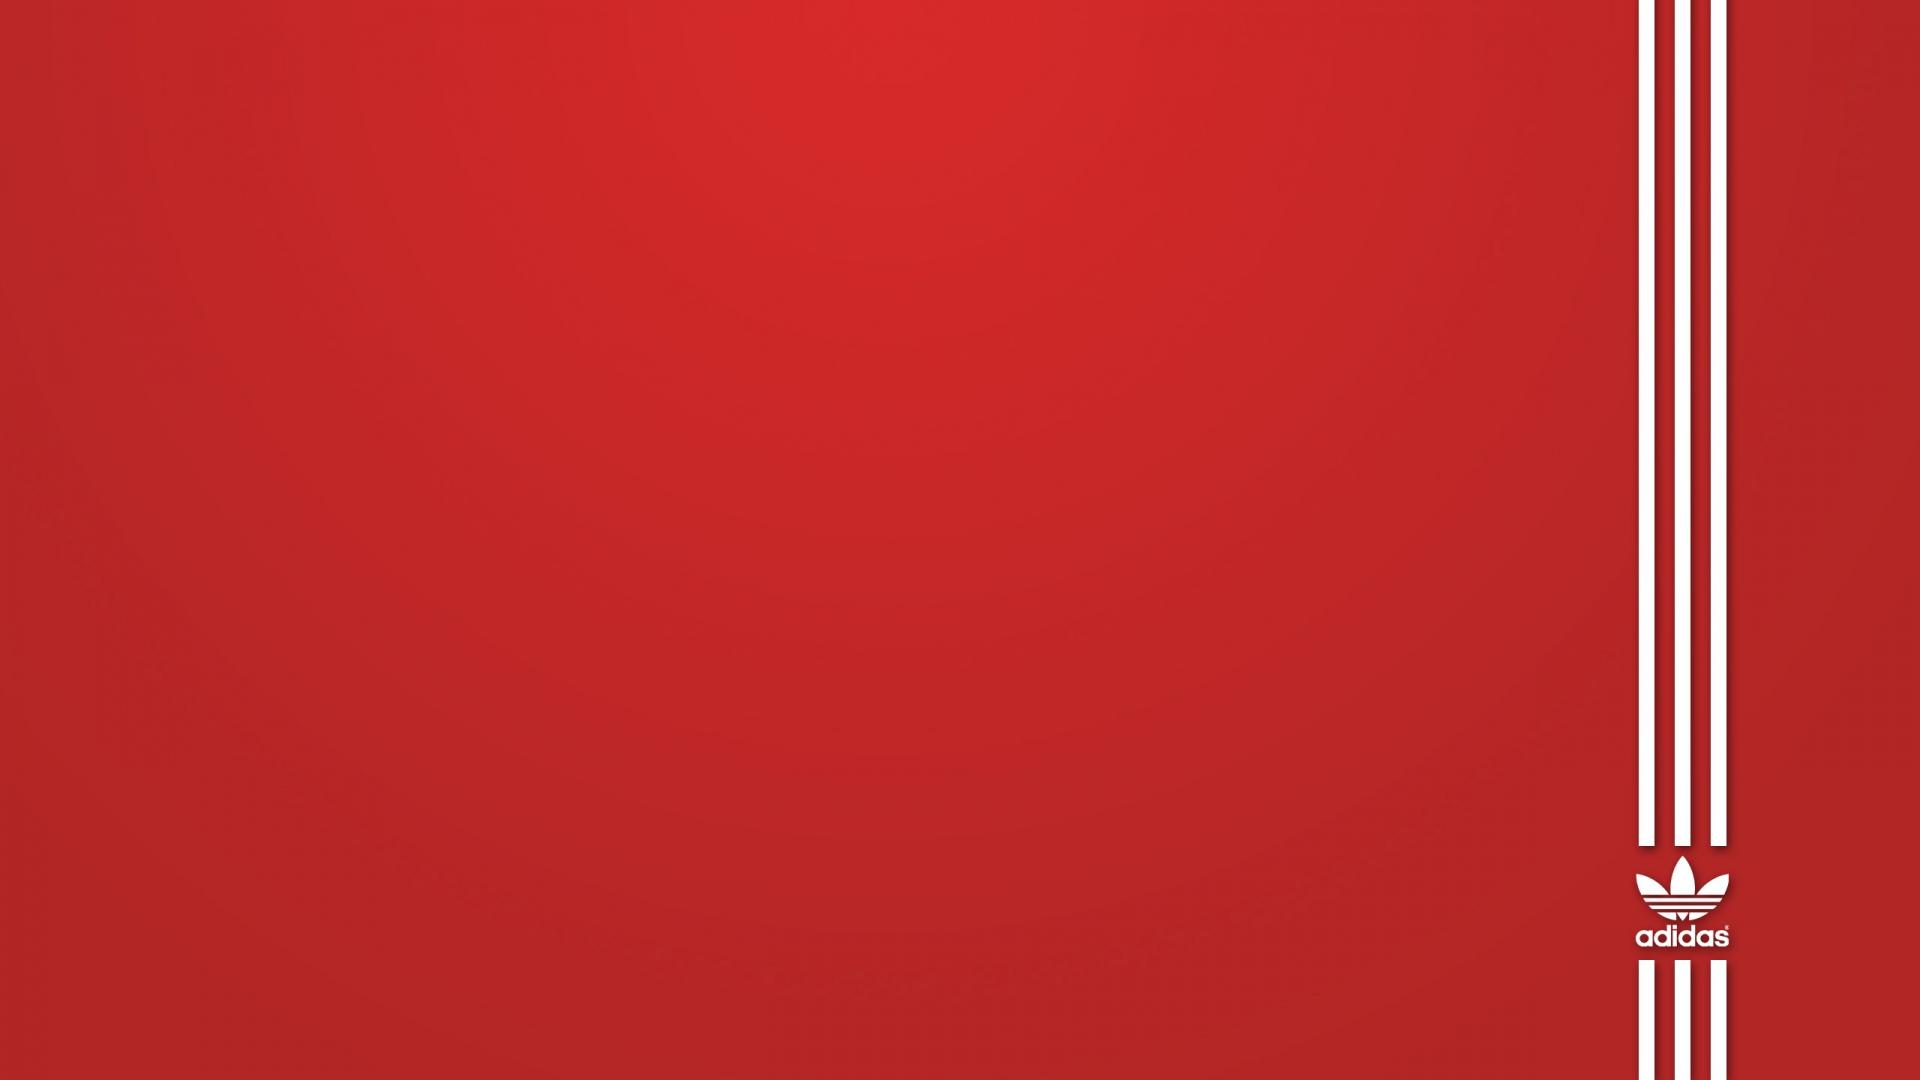 brand adidas red white sport hd wallpaper 1920x1080